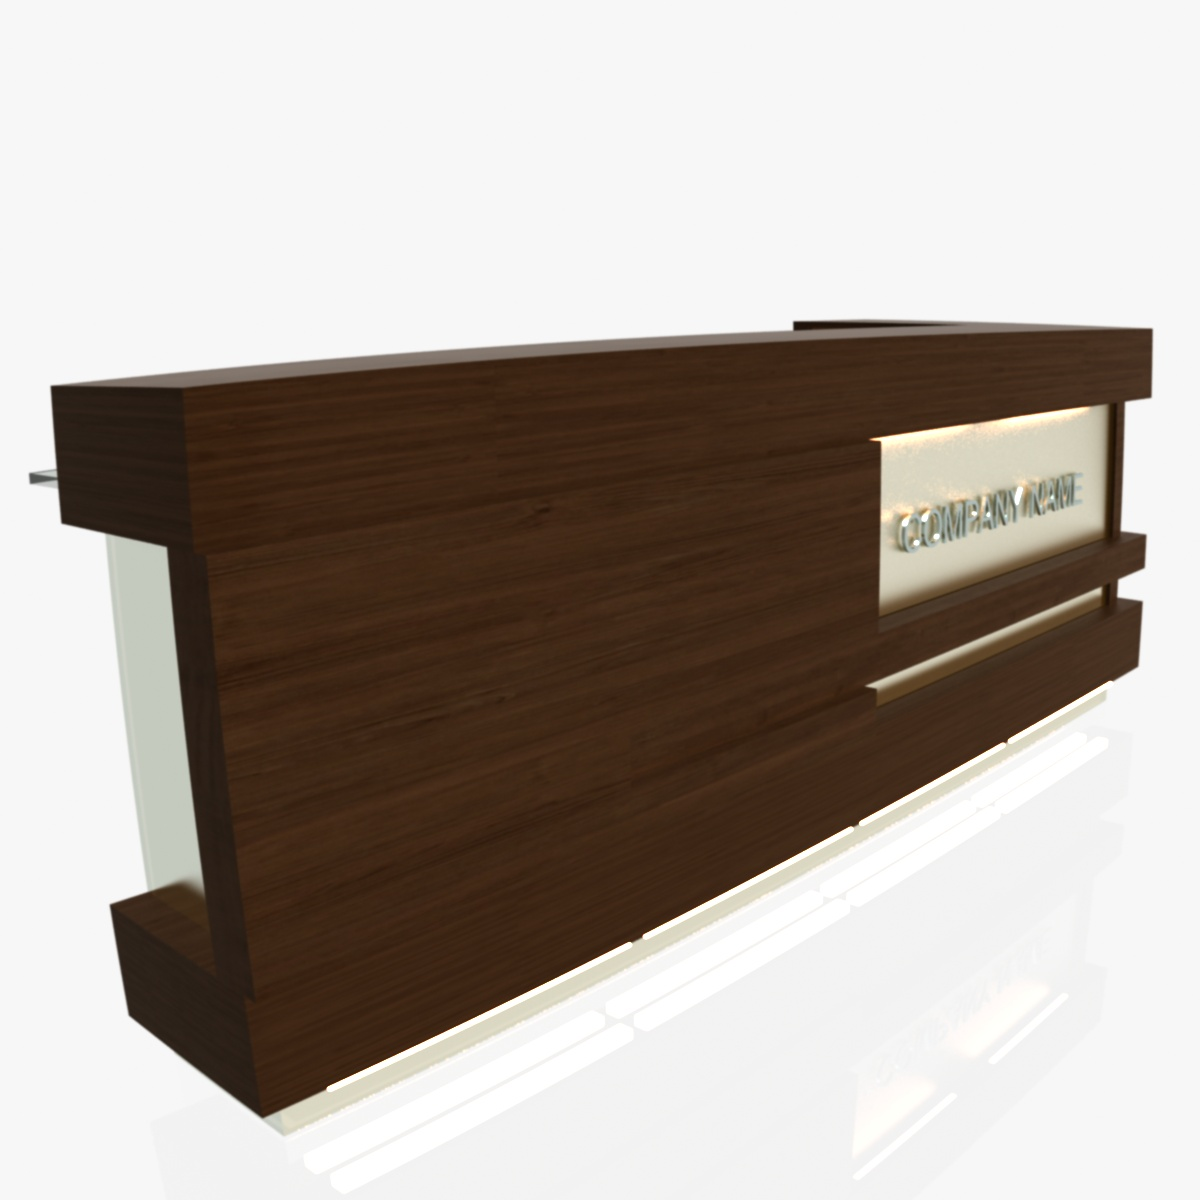 reception desk 1 3d model 3ds max dxf fbx  obj 219850